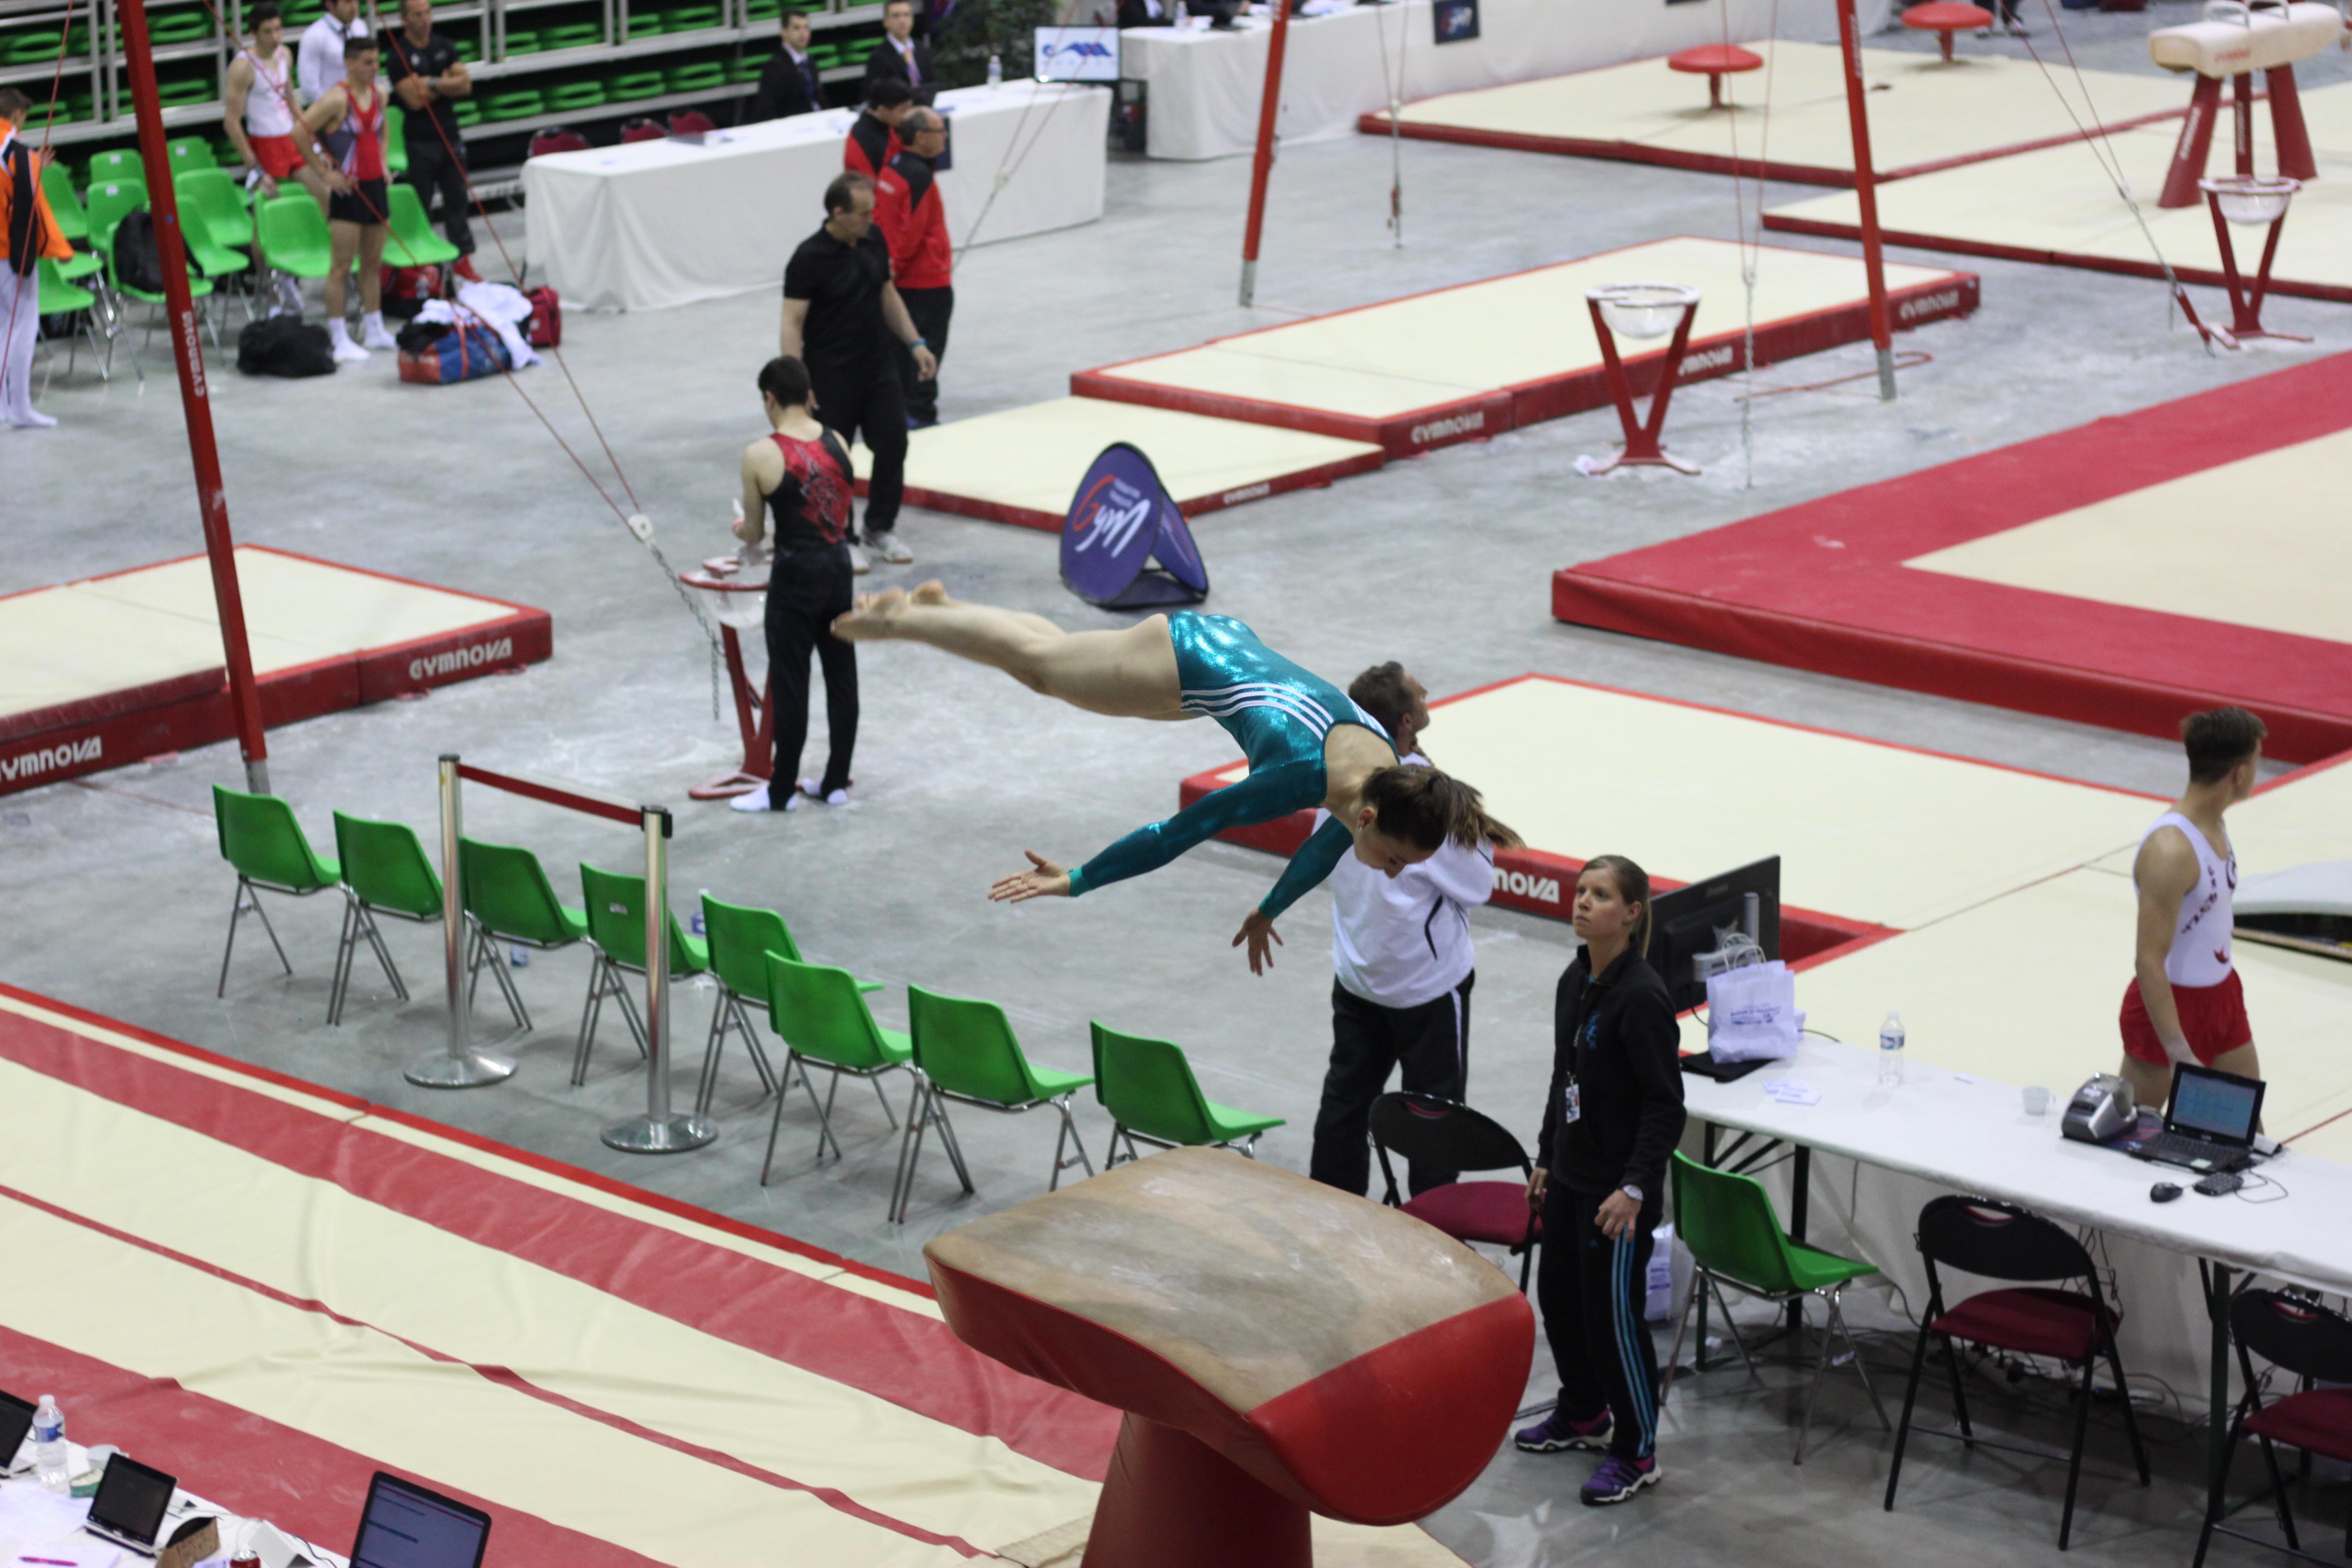 Juliette saut (15)